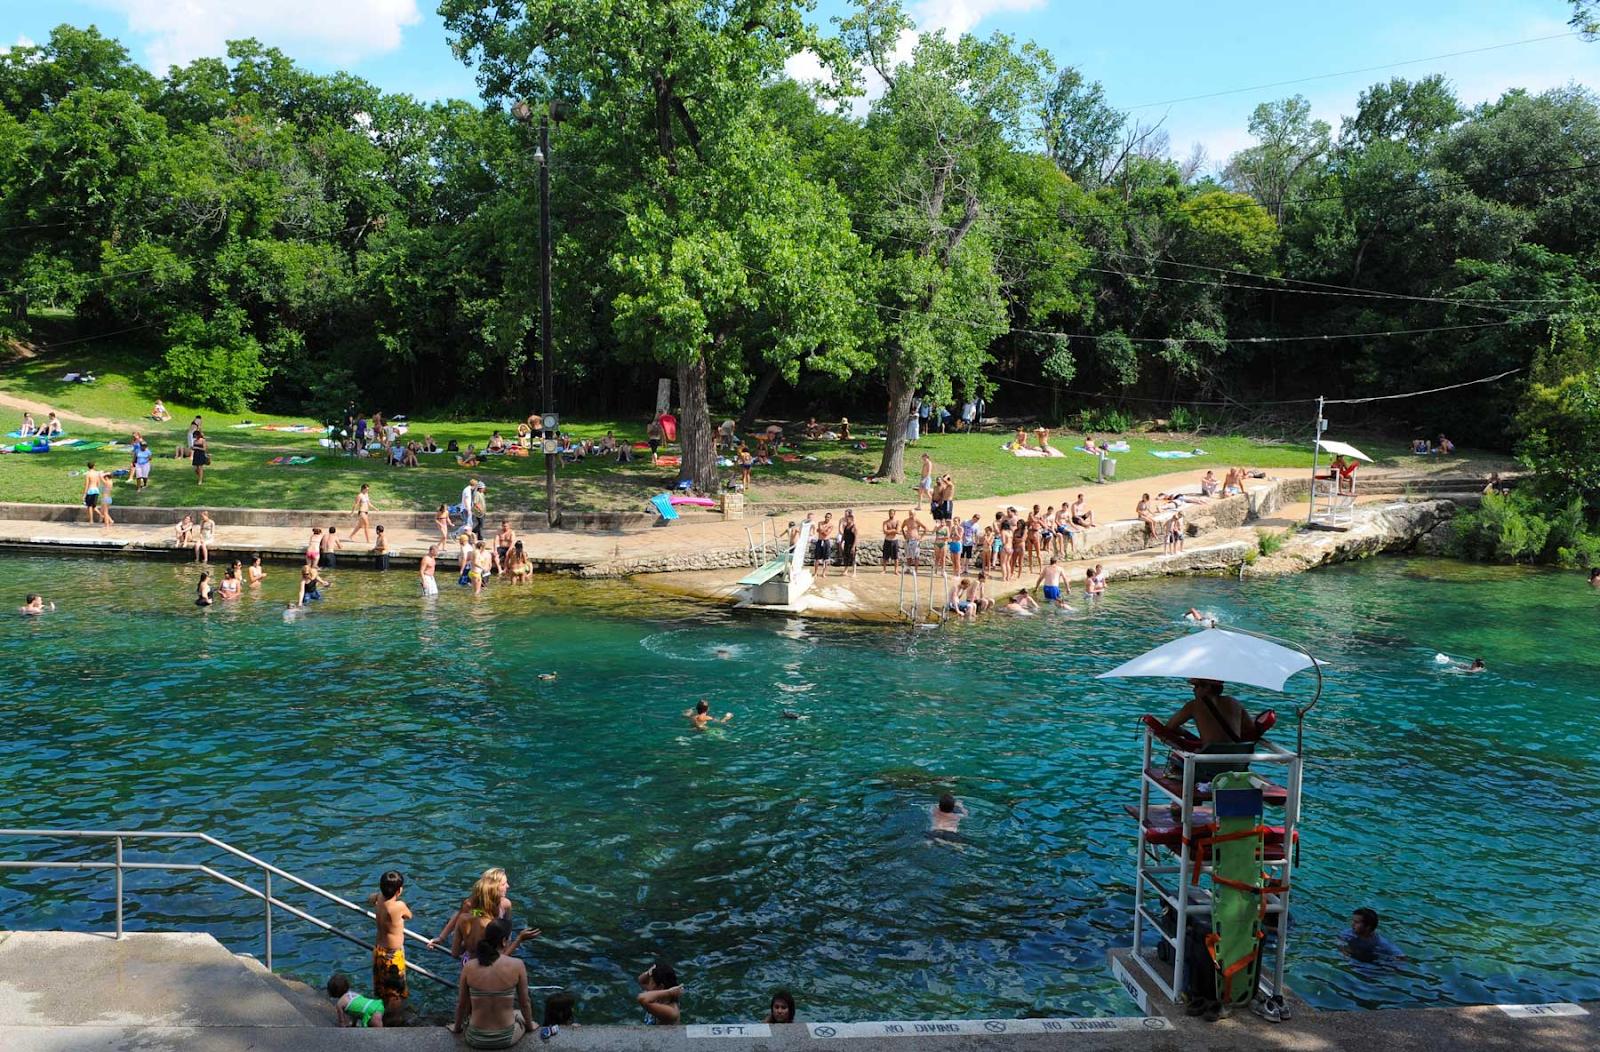 Things to do in Austin, Texas - Barton Springs Pool